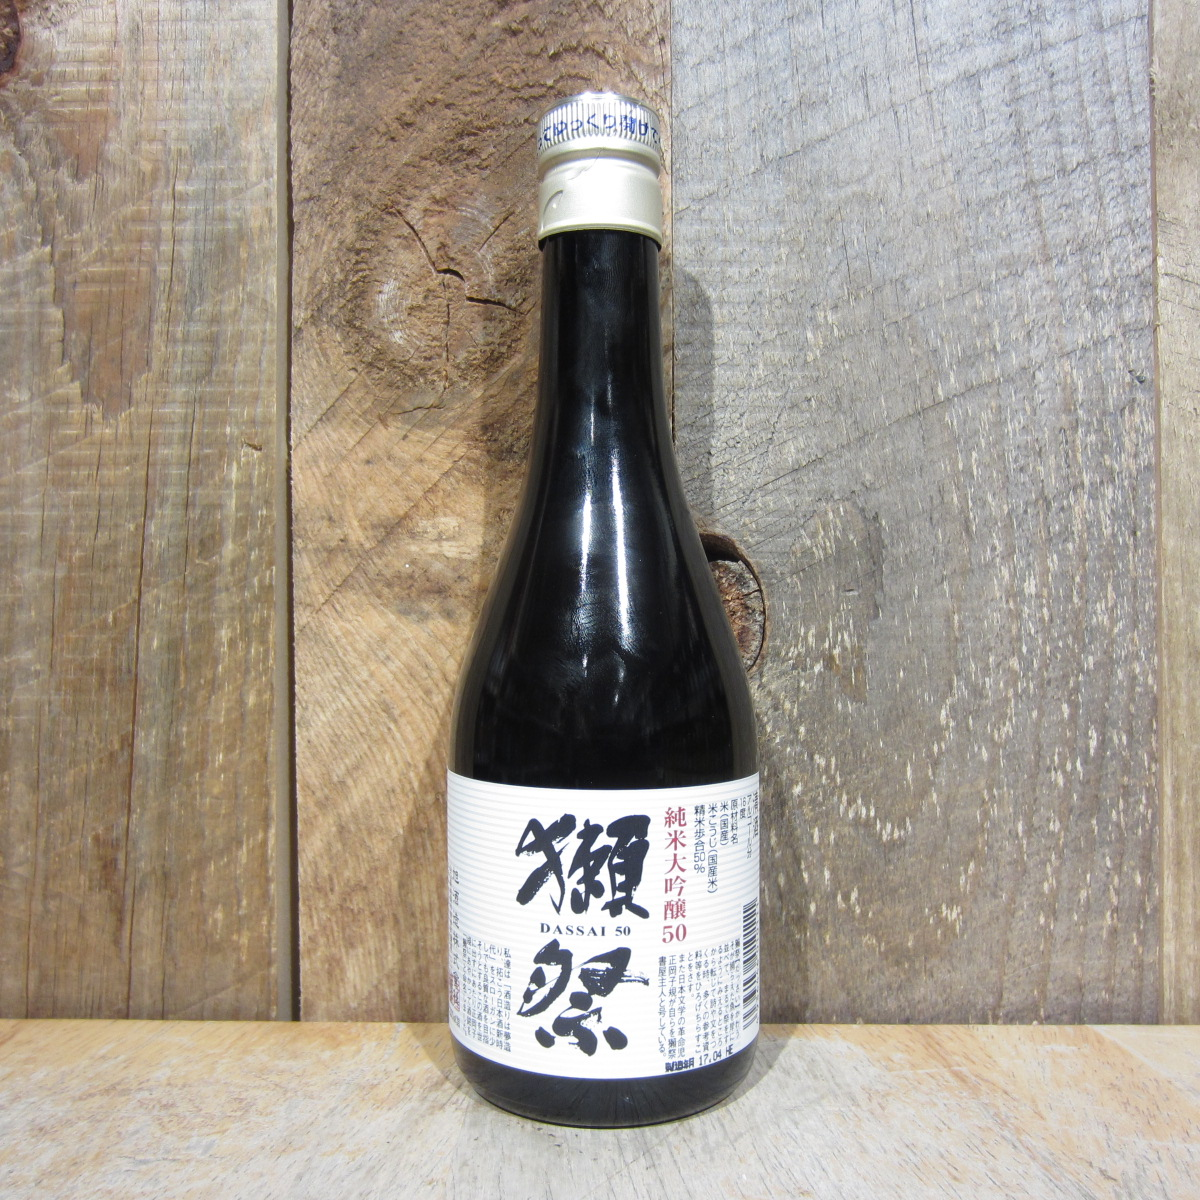 Dassai 50 Junmai Daiginjo (Half Size Btls) 300ml